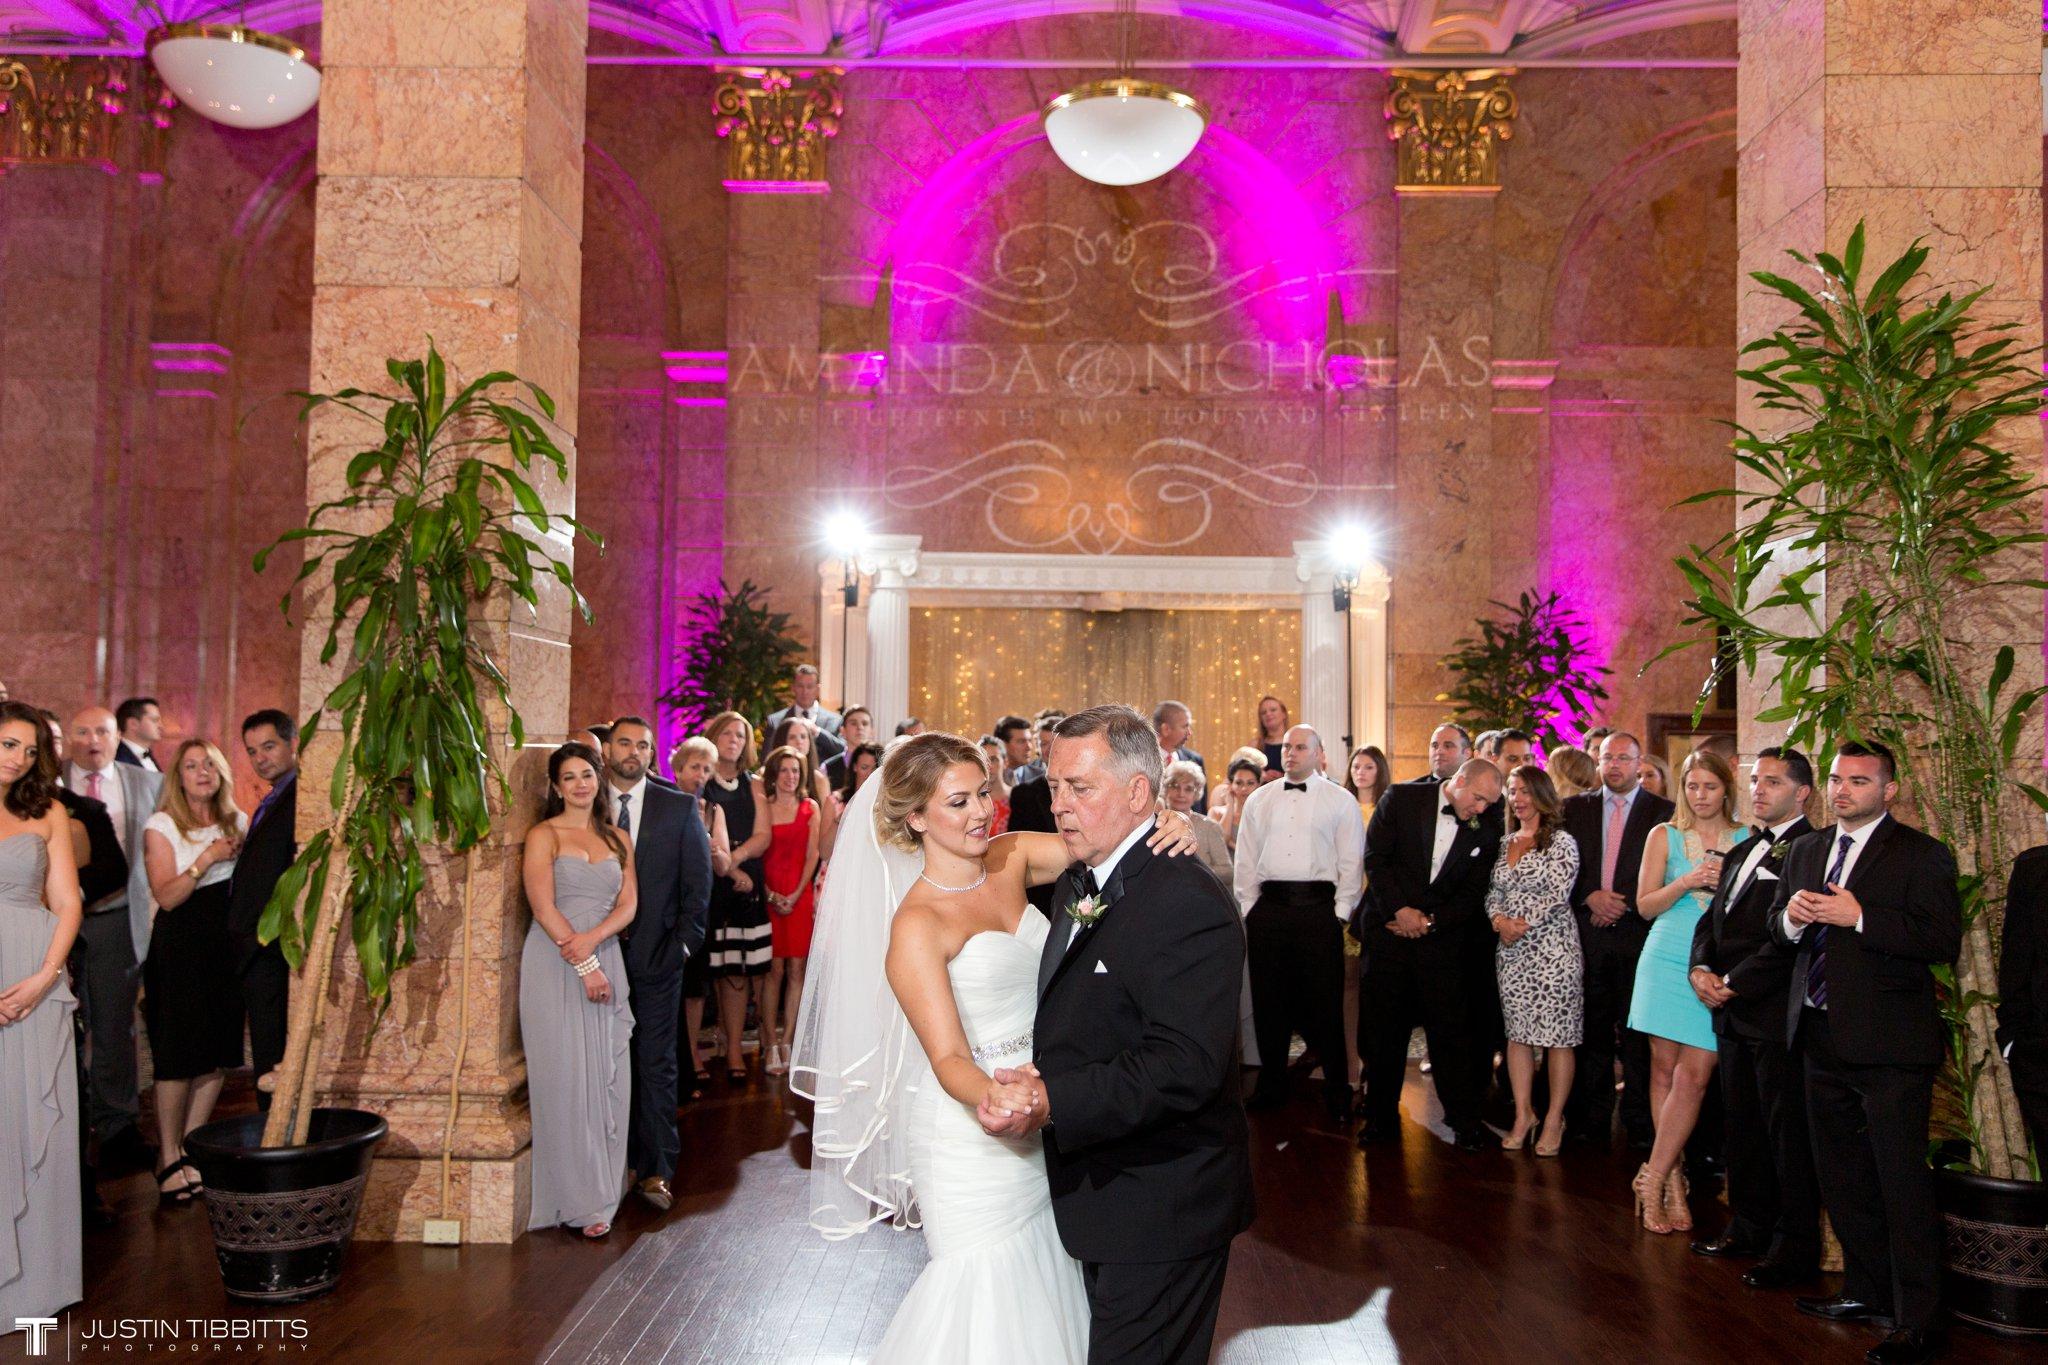 state-room-wedding-photos-with-amanda-and-nick_0162